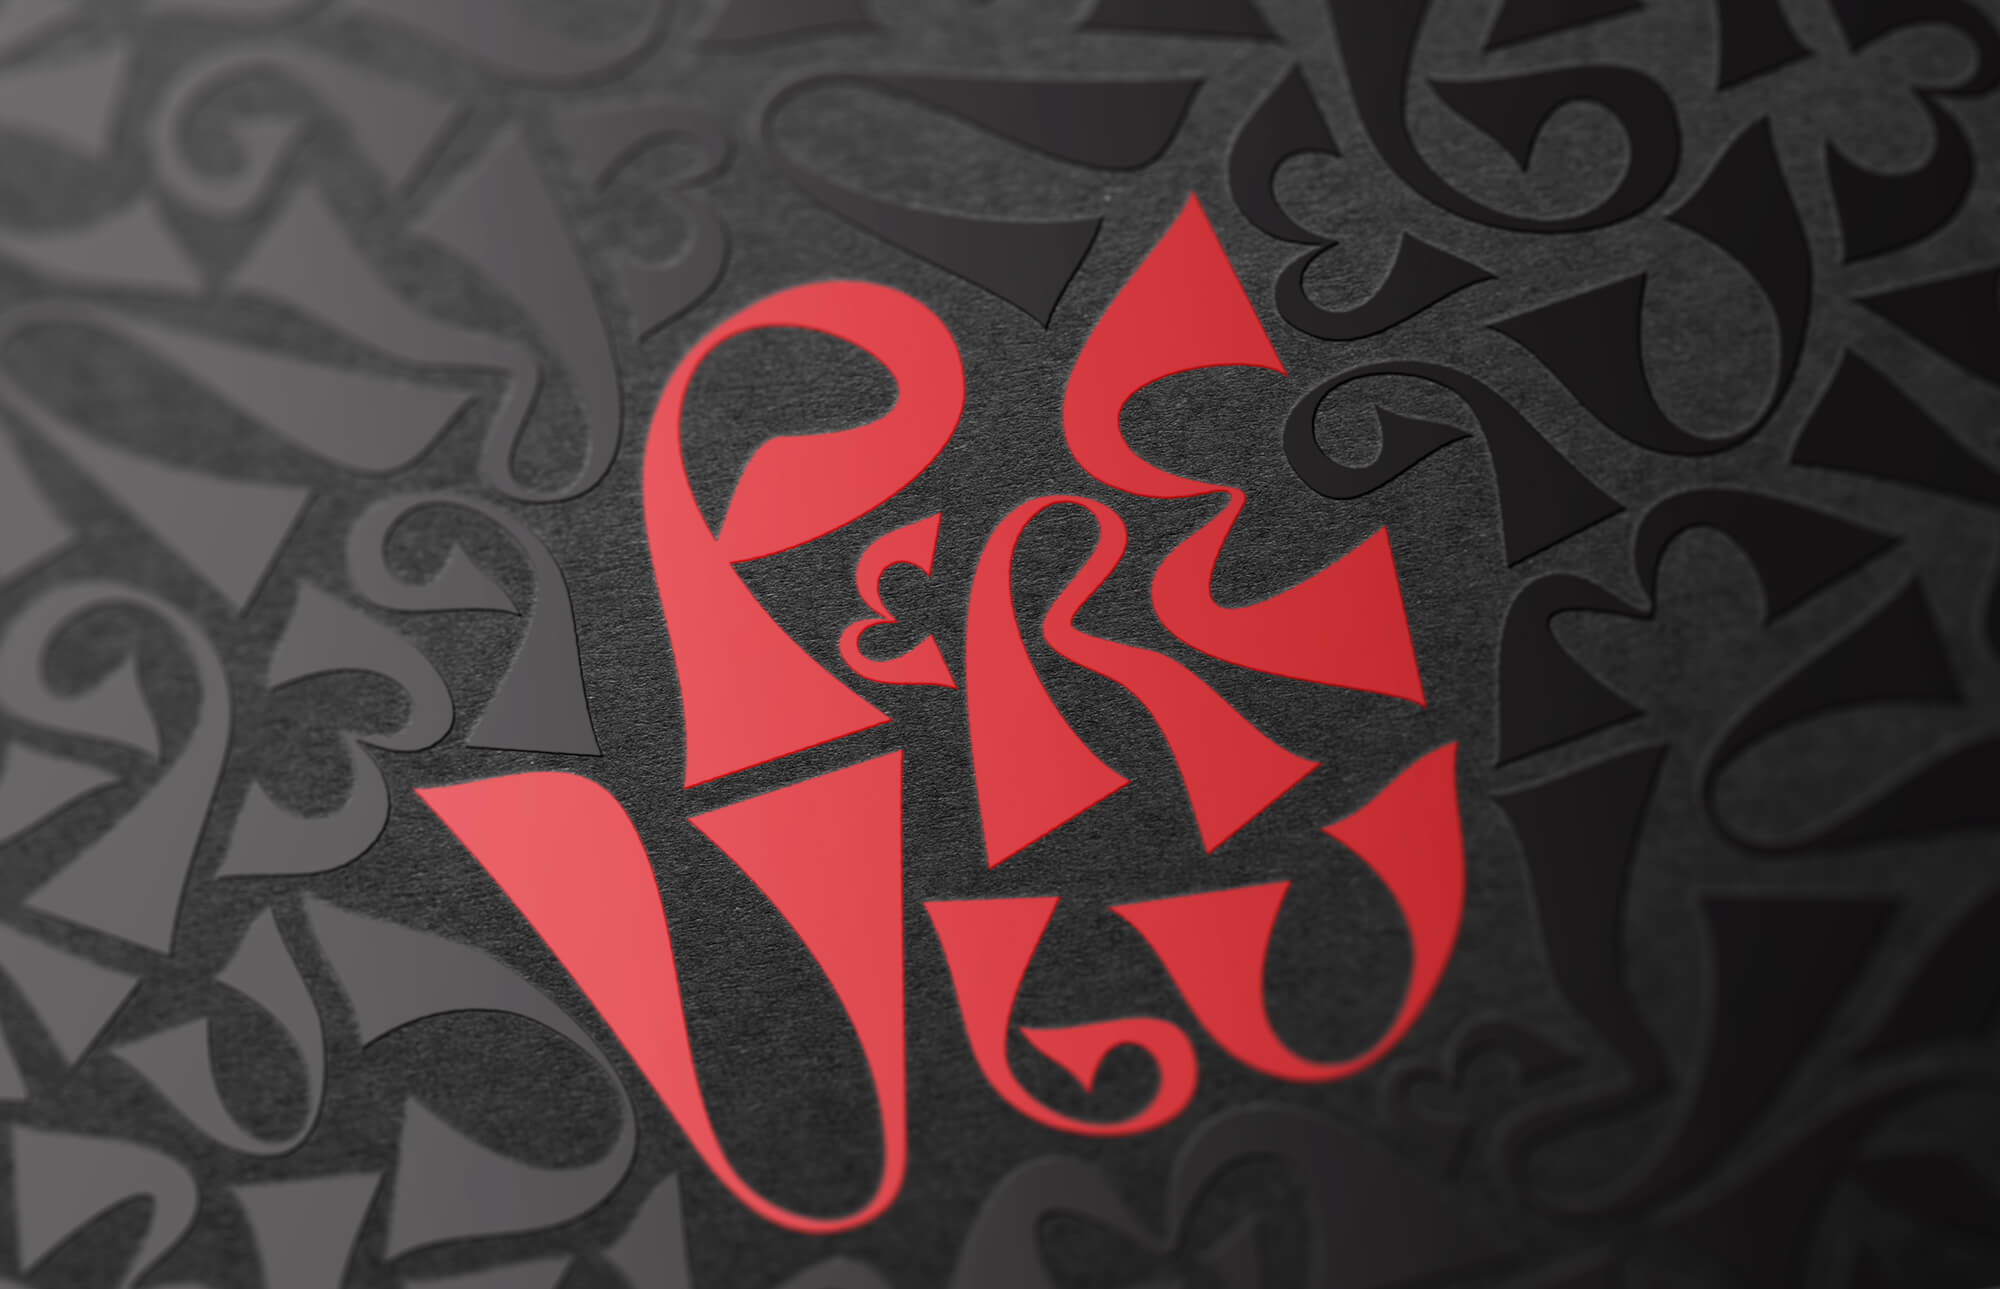 Pere Ubu restaurant logo design using a custom font created by Reform Design, Cyprus.